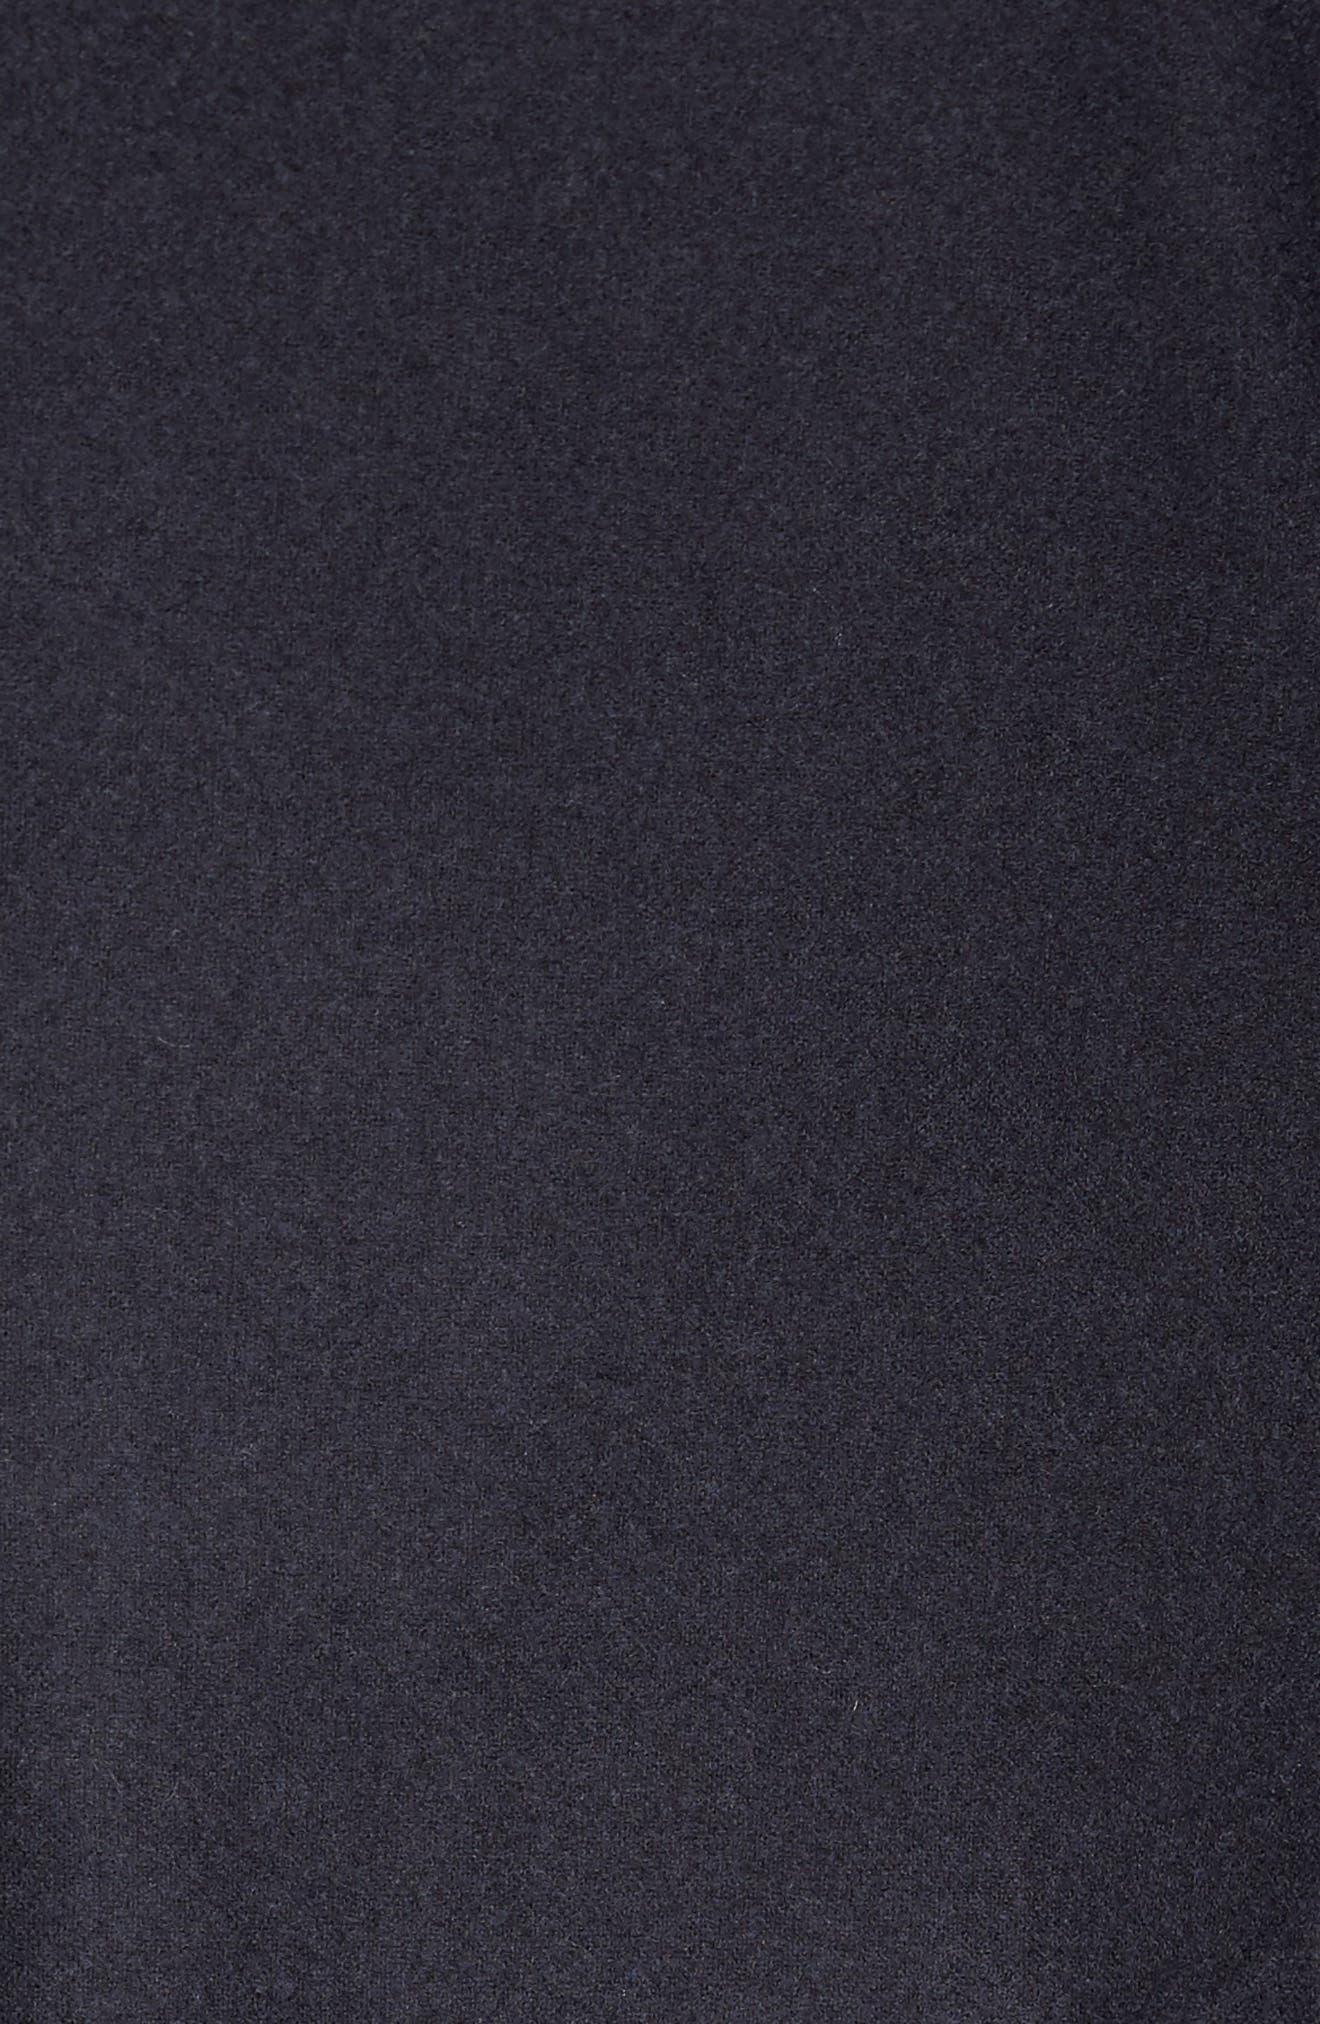 Trim Fit Wool Blend Blazer,                             Alternate thumbnail 6, color,                             002